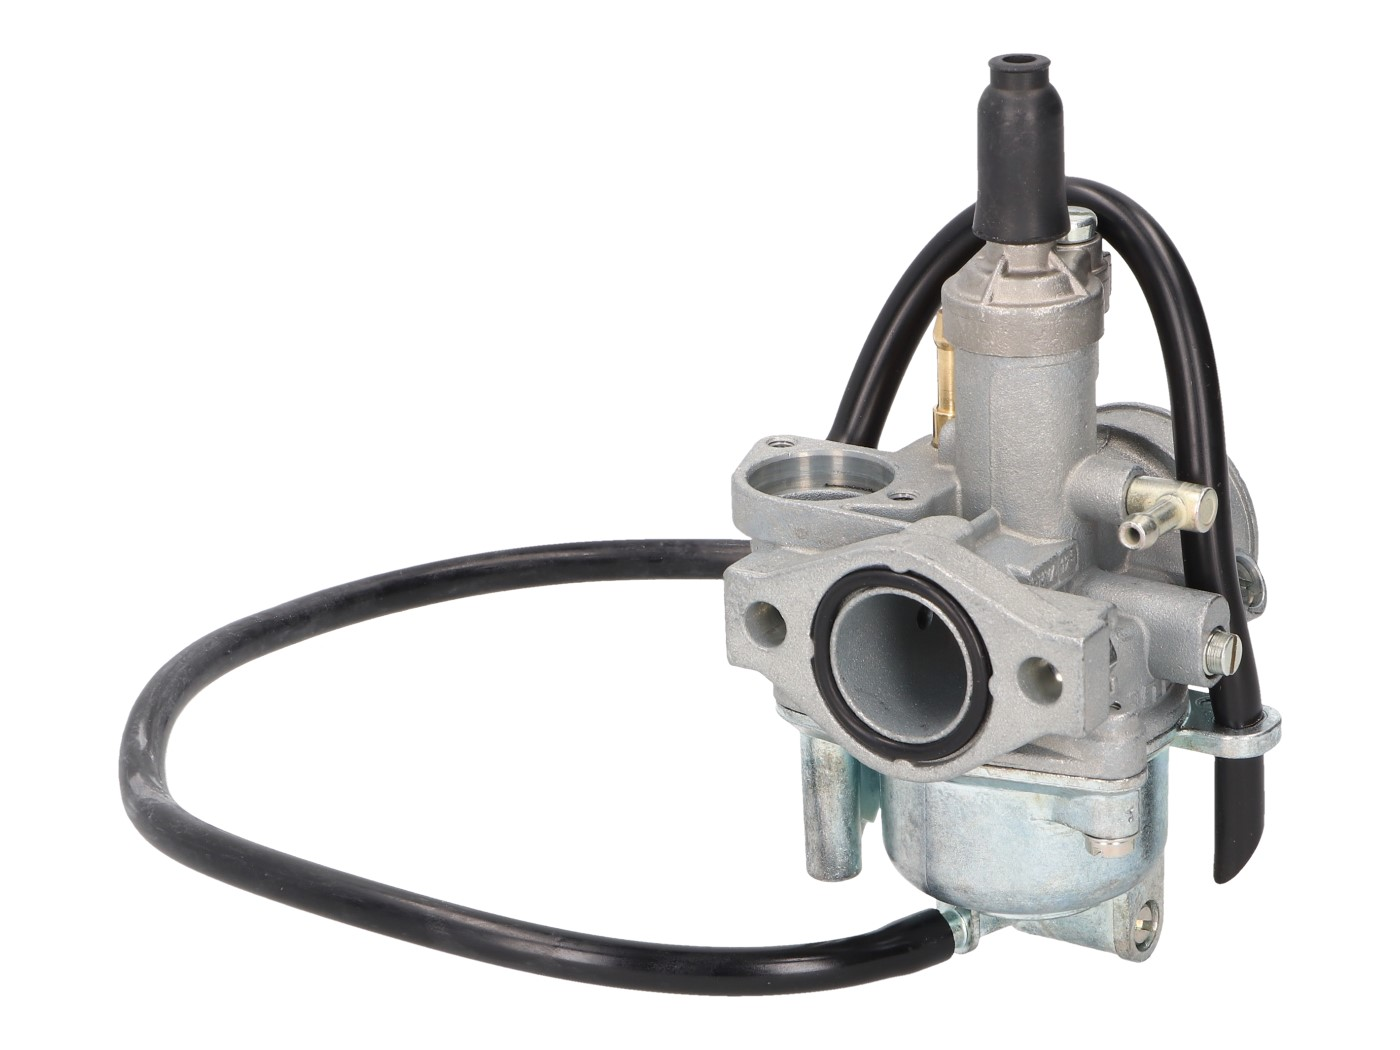 Sport Racing Carburateur 17 mm 1 17 41 carburateur pour Zündapp Kreidler Mobylette